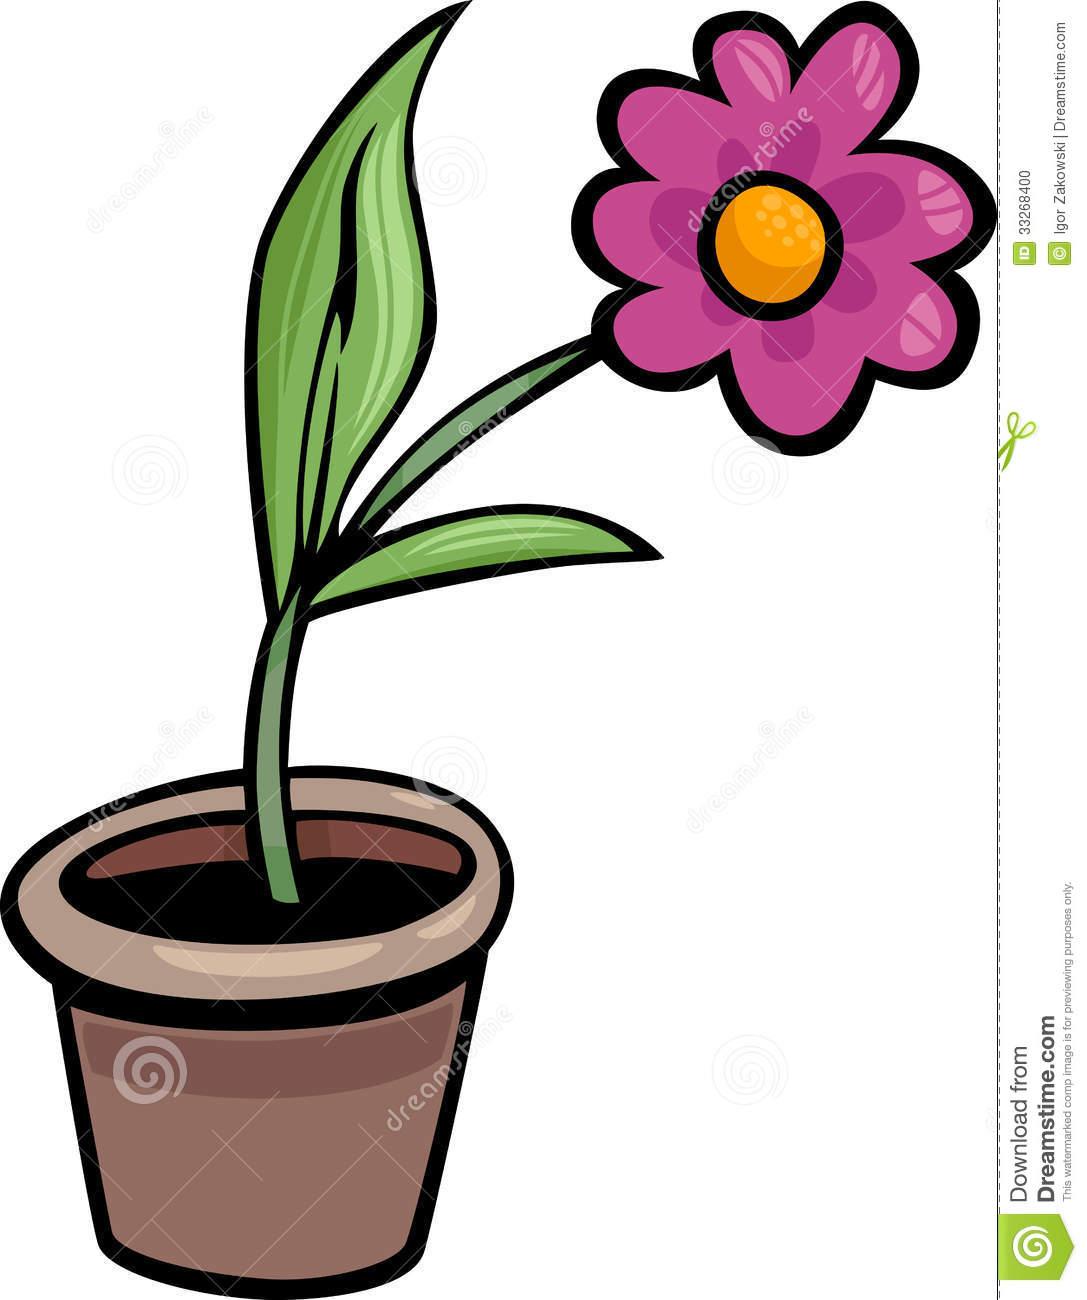 1087x1300 Happy Flower Cartoon Pictures Clip Art Pink Clipart Clipart Panda